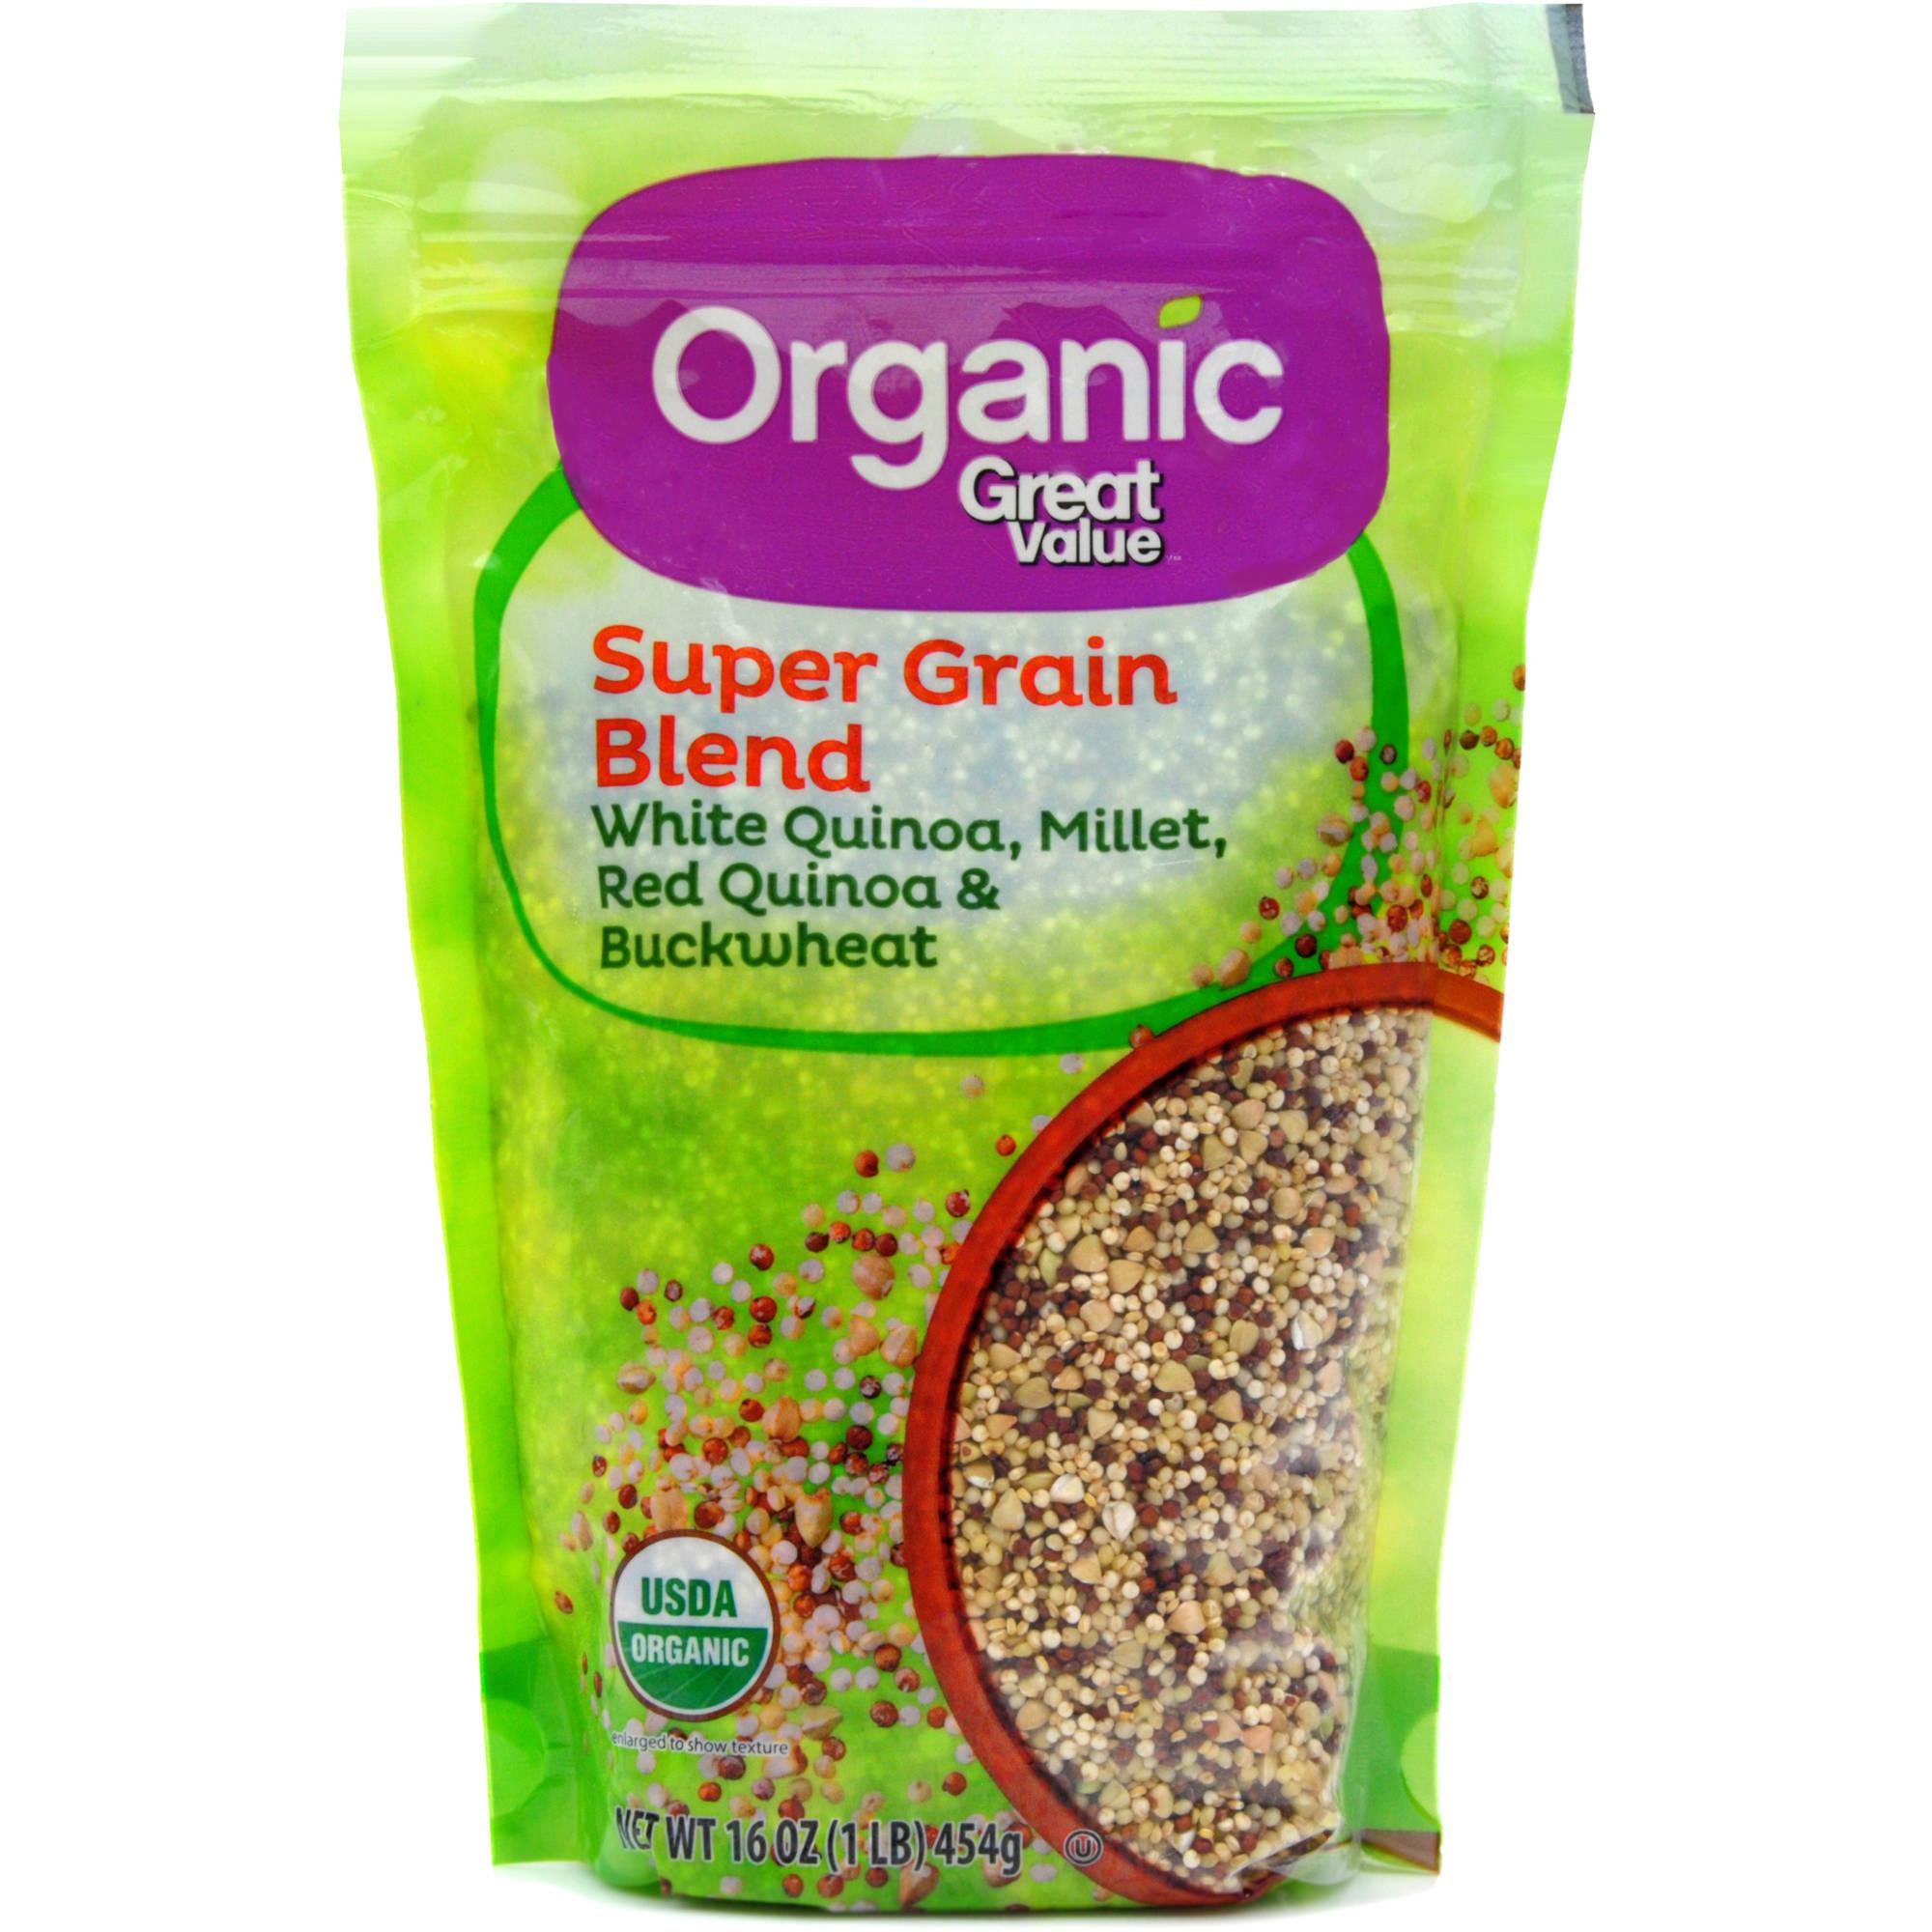 (2 Pack) Great Value Organic Super Grain Blend, 16 oz